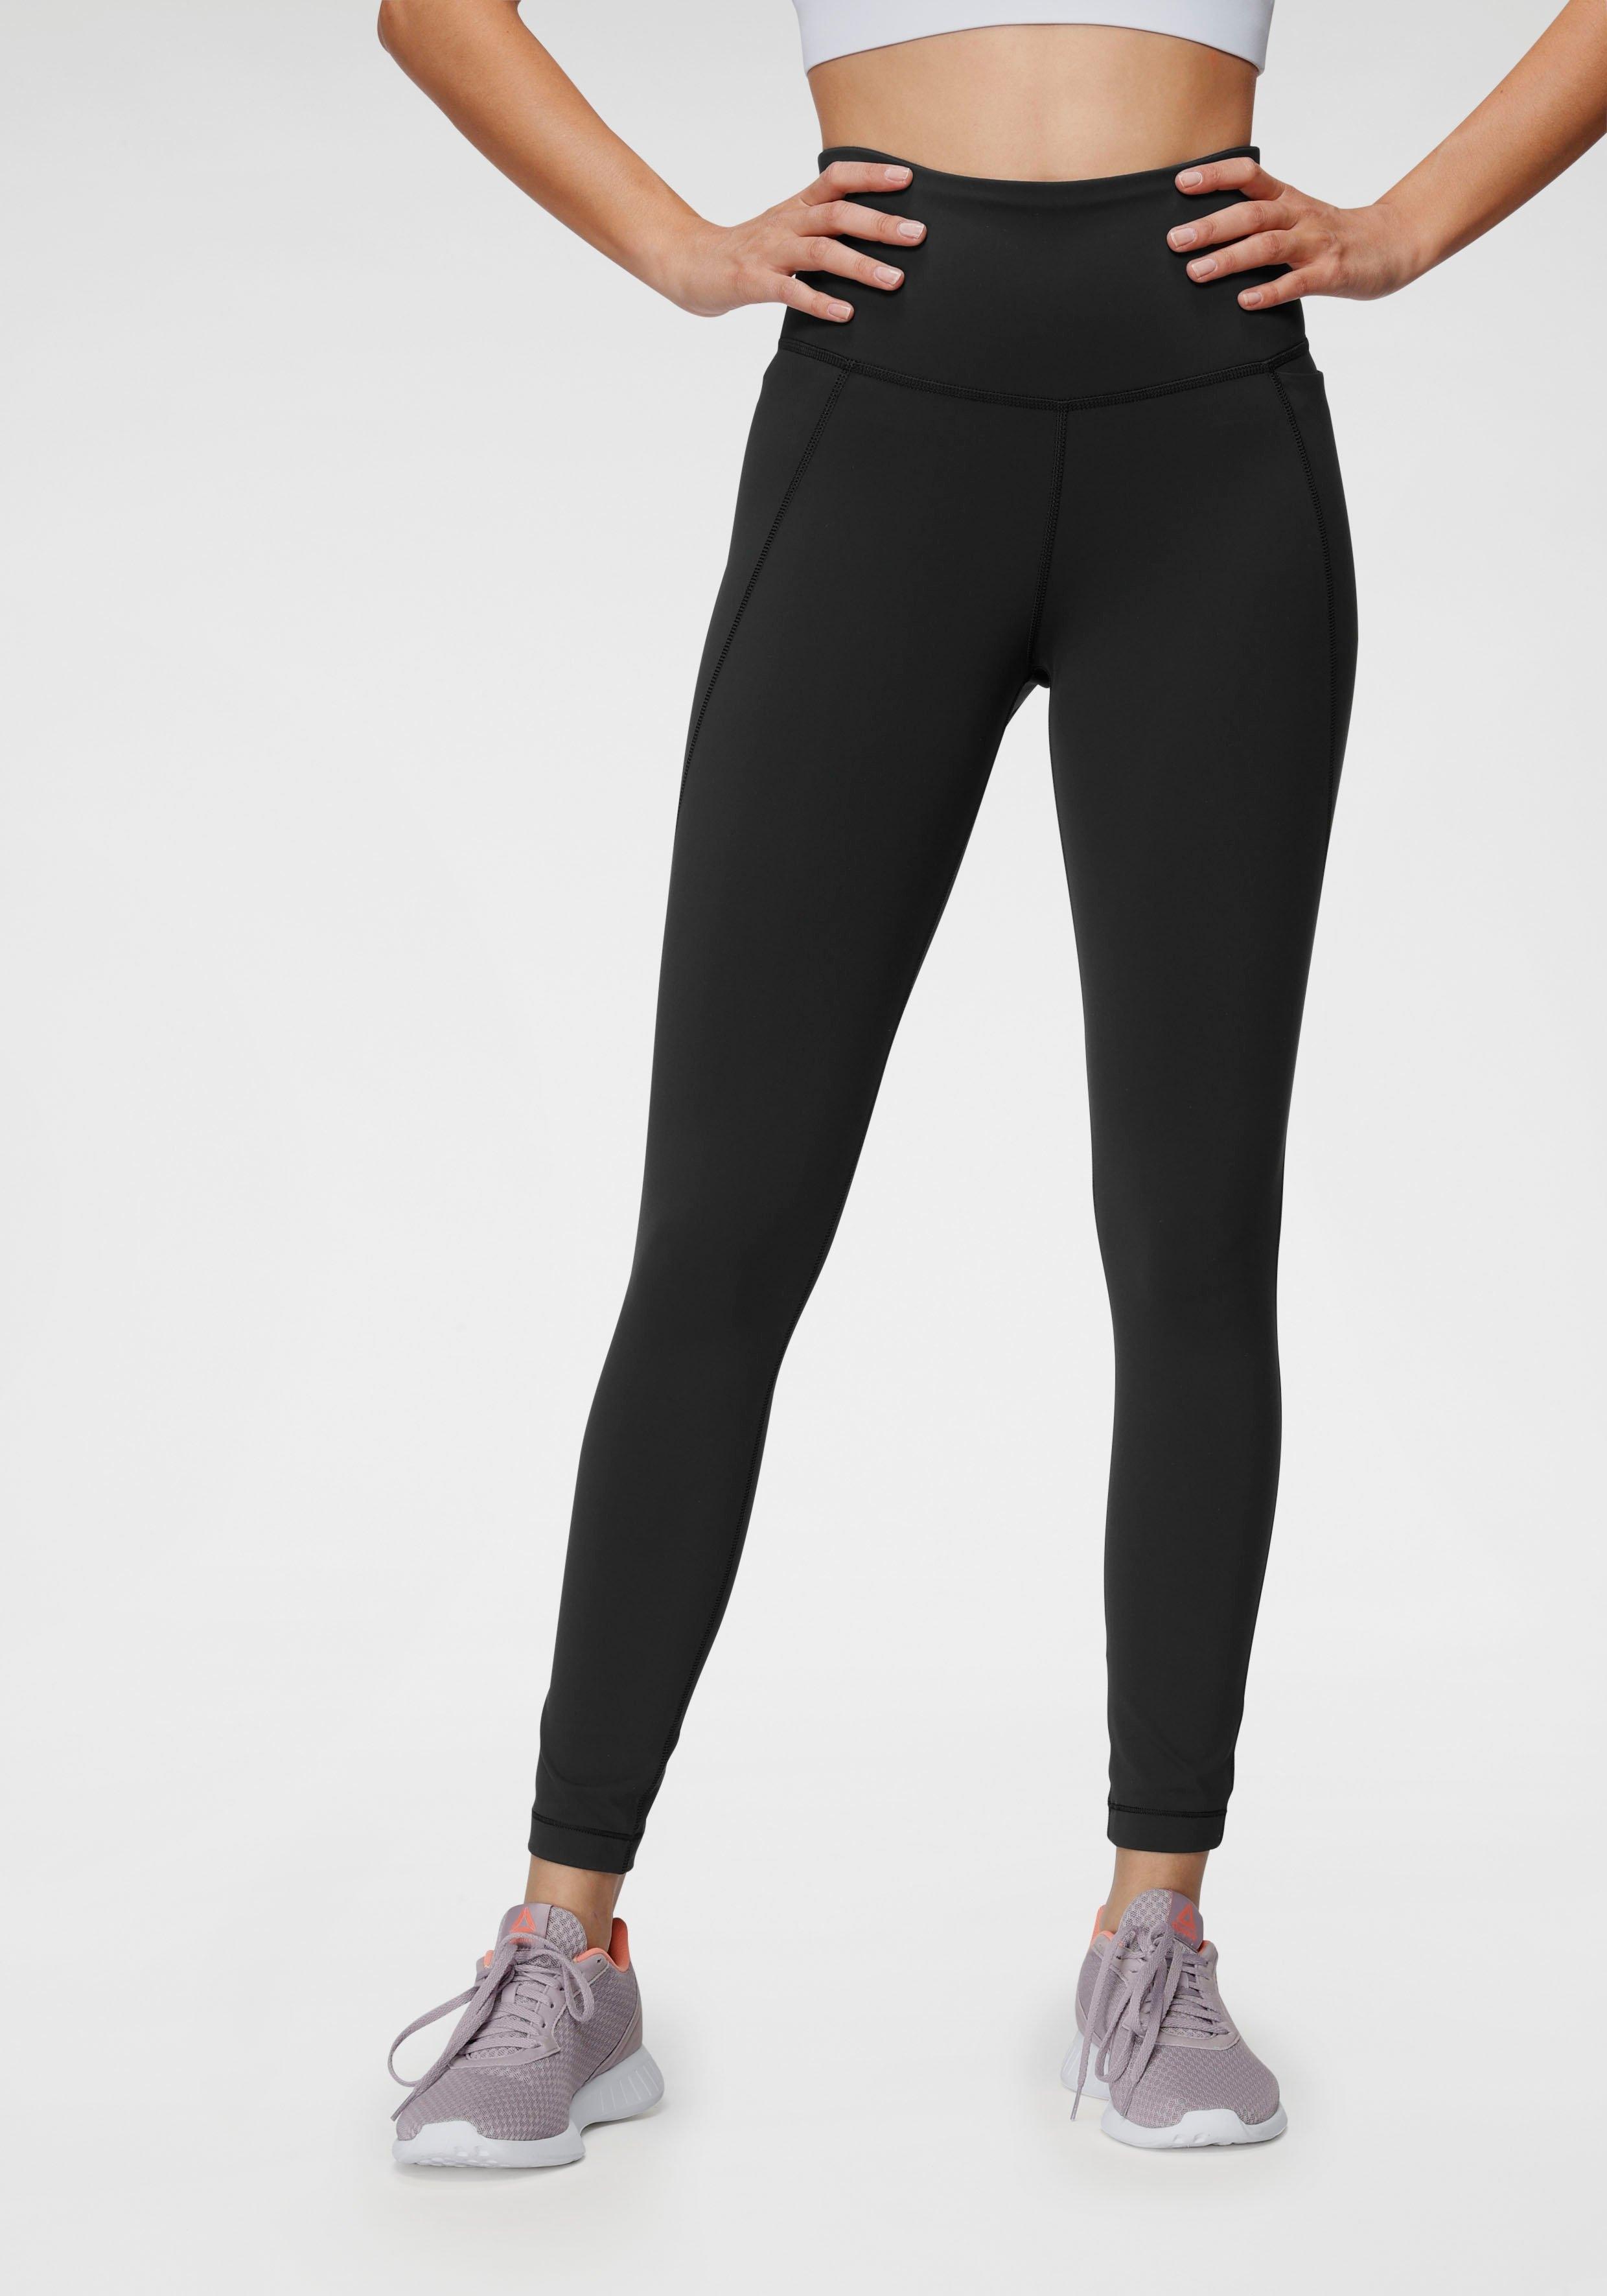 Reebok functionele tights »TS LUX HIGHRISE TIGHT« bij OTTO online kopen